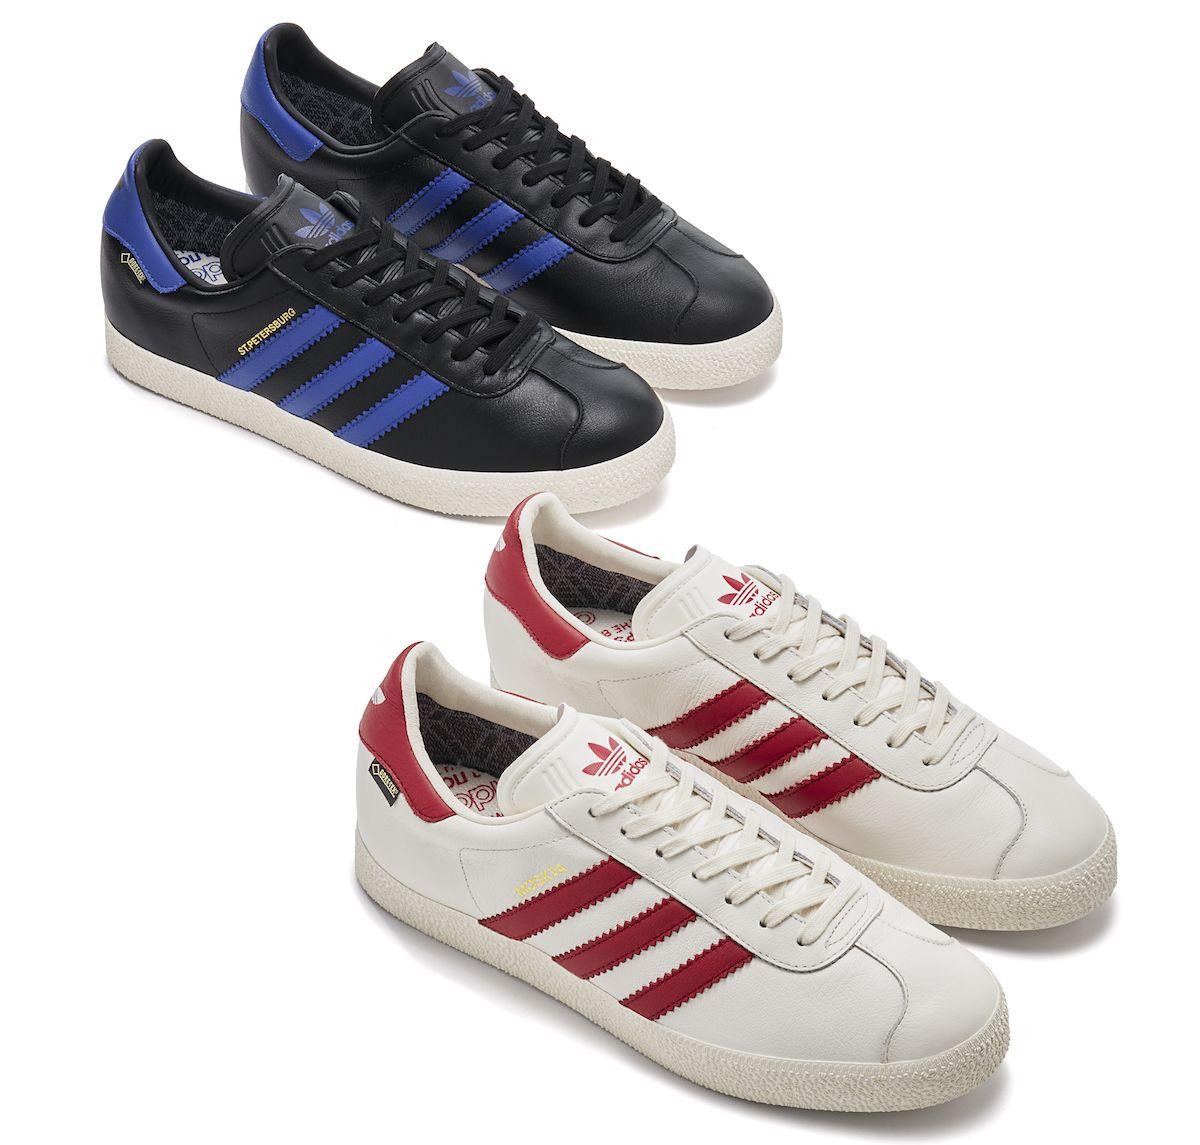 check out d4c90 39089 adidas Originals Gazelle